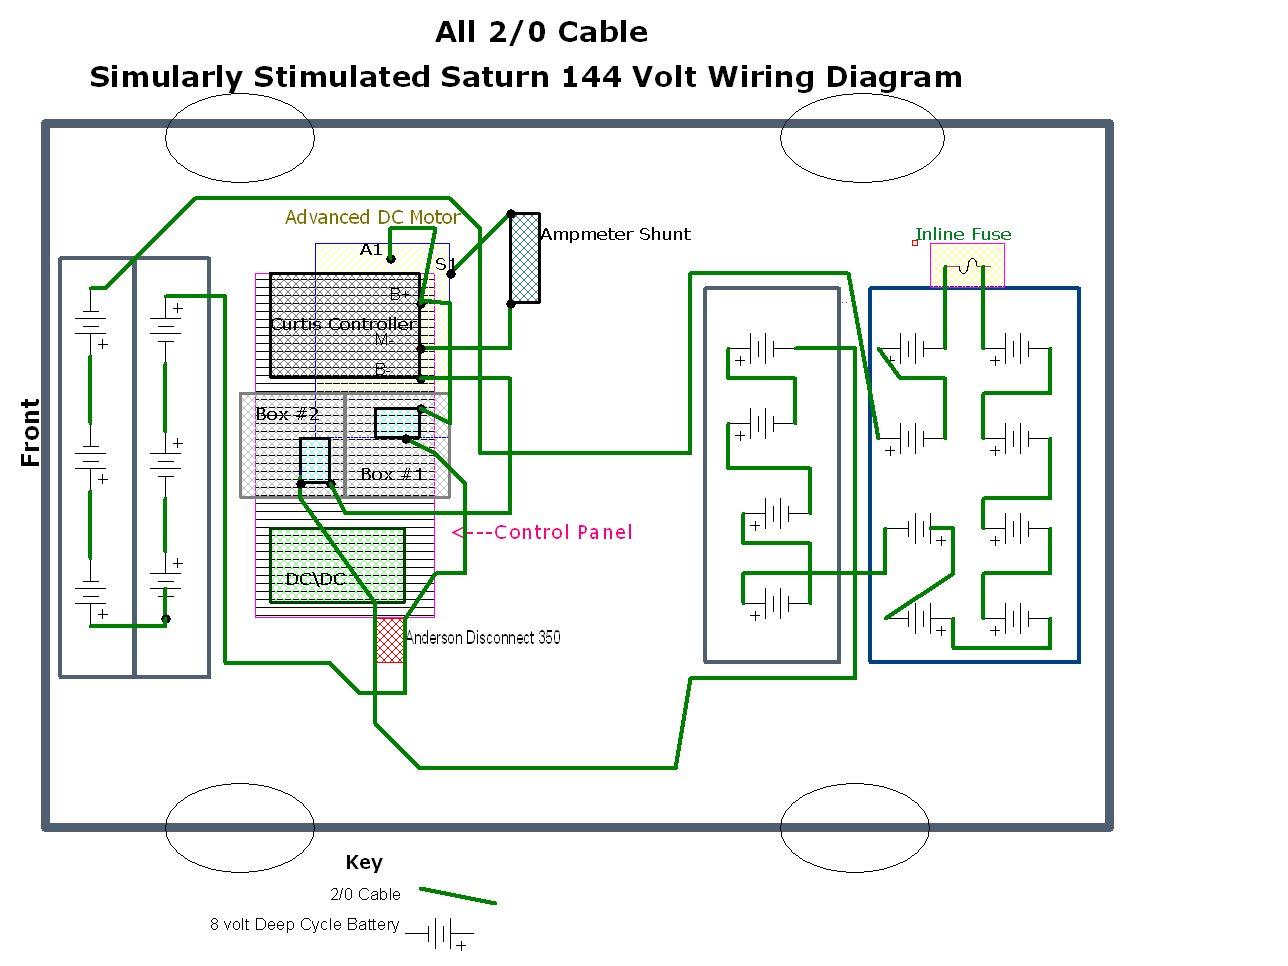 Peachy Inverter Wiring Diagram Together With Iota Emergency Ballast Wiring Wiring Cloud Ostrrenstrafr09Org